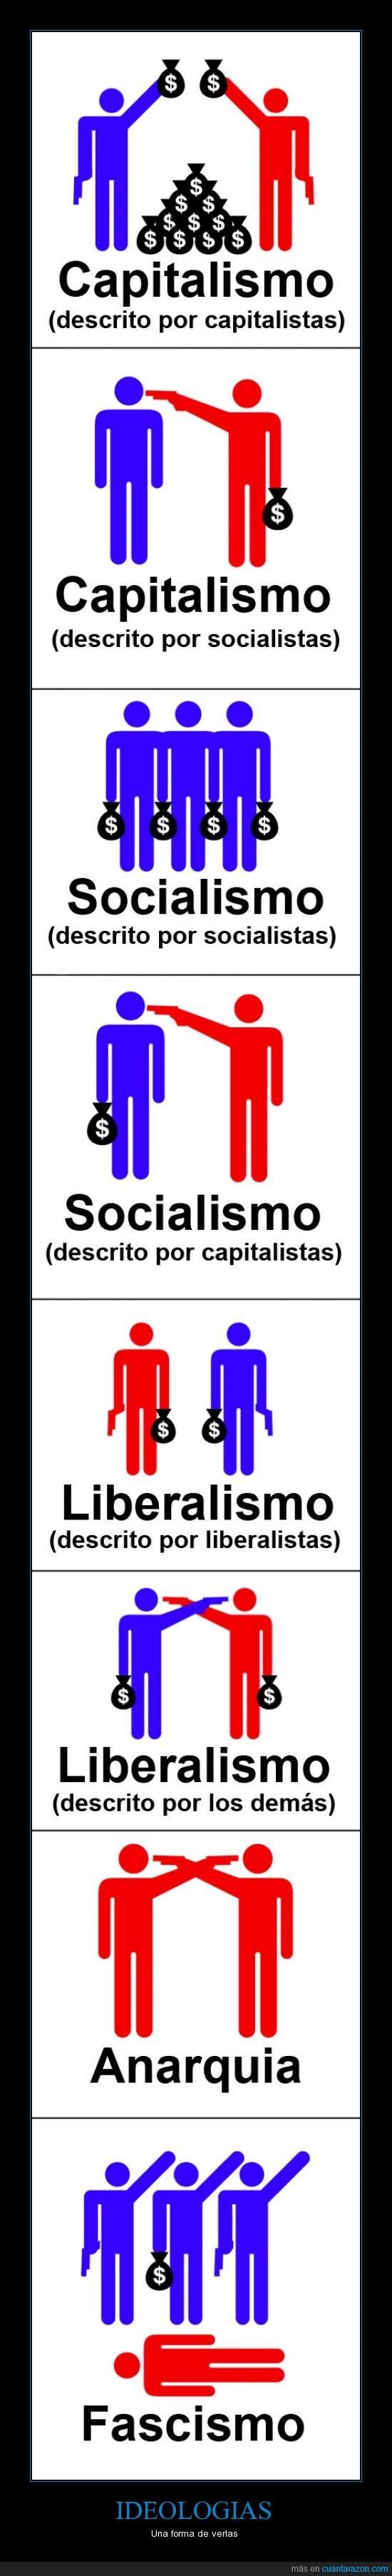 anarquia,capitalismo,fascismo,ideologia,liberalismo,politica,socialismo